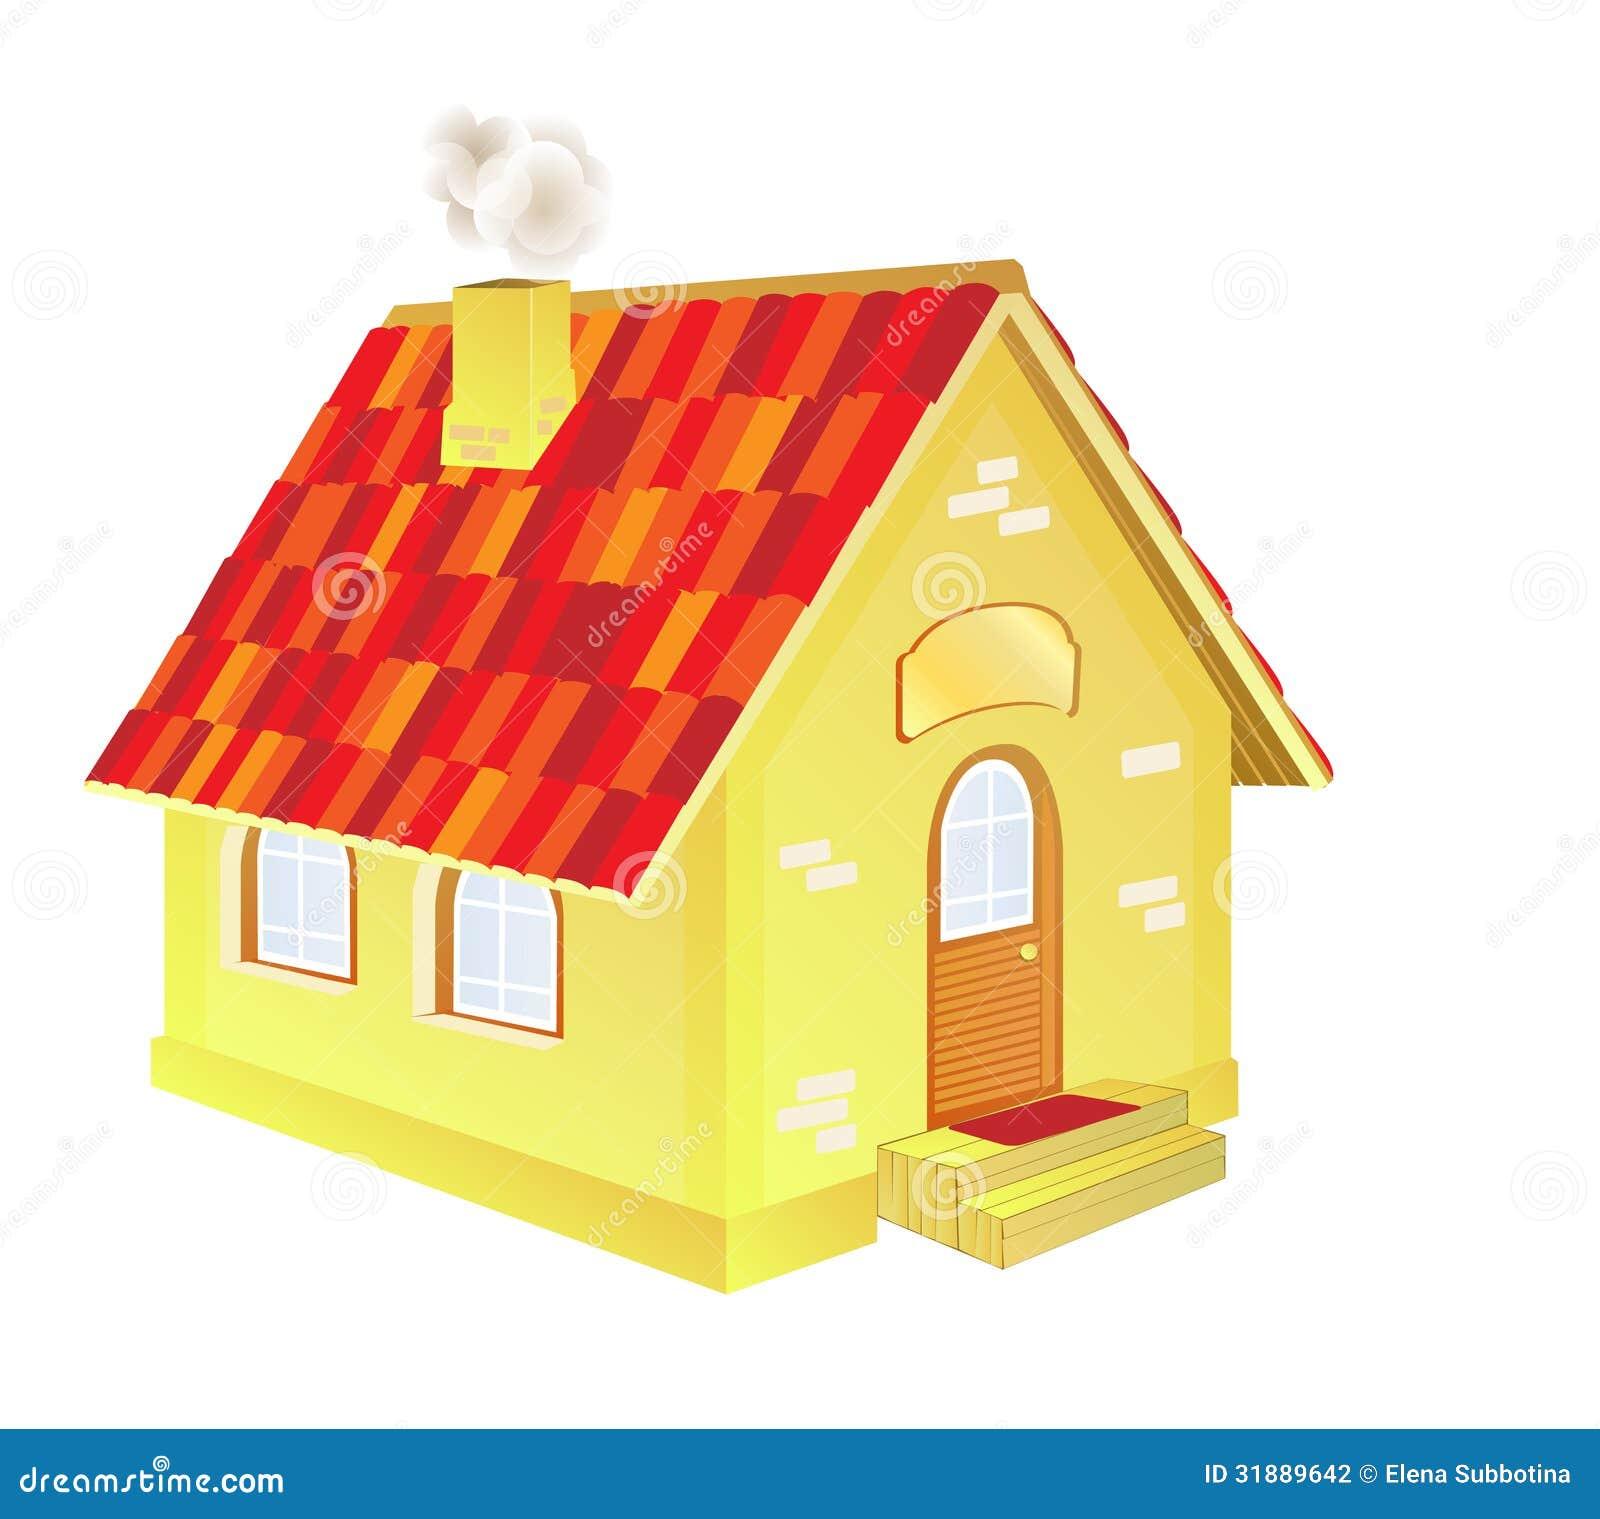 Casitas De Campo #3: Cute-cartoon-country-house-vector-illustration-isolated-white-31889642.jpg